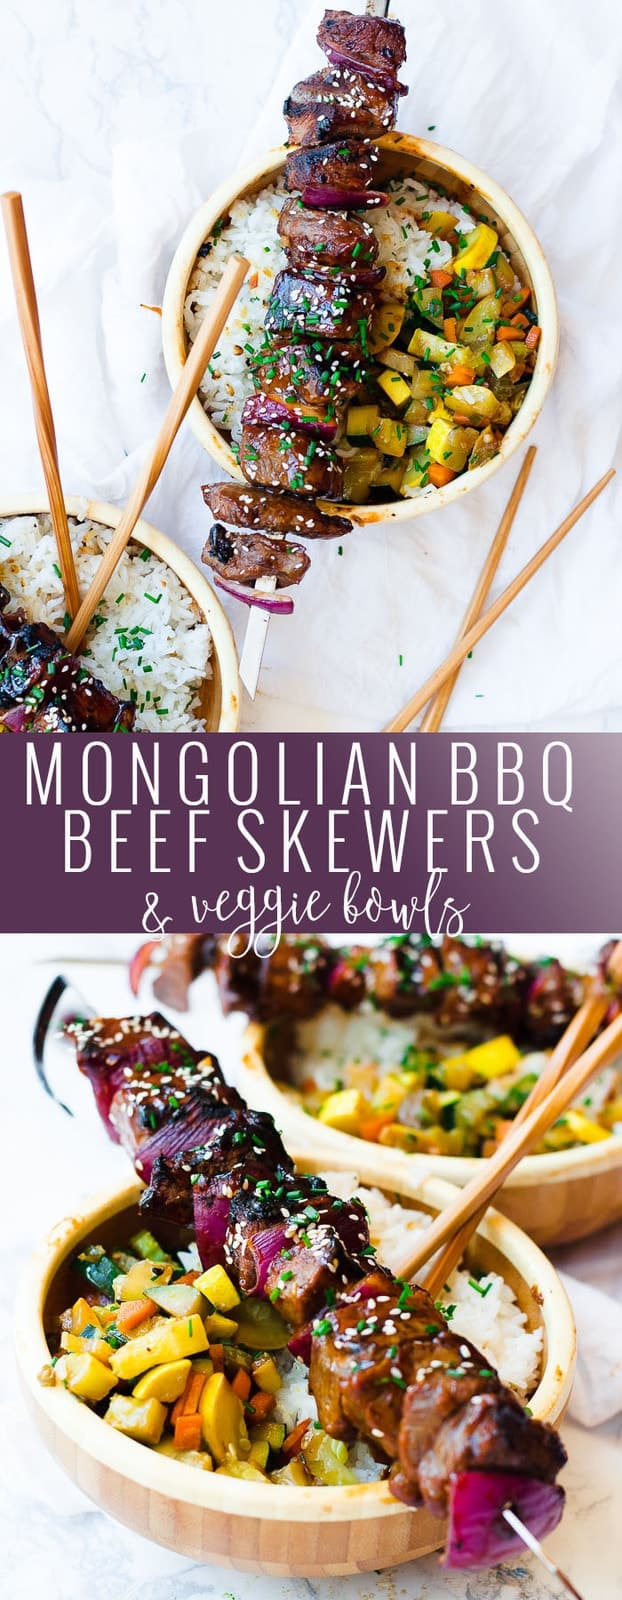 Mongolian BBQ Beef Skewers & Veggie Bowls | homemade asian inspired recipes | healthy asian recipes | easy skewer recipes | homemade beef skewers || Oh So Delicioso #ad #mongolianbeef #beefskewers #asianrecipes @pfchangshomemenu